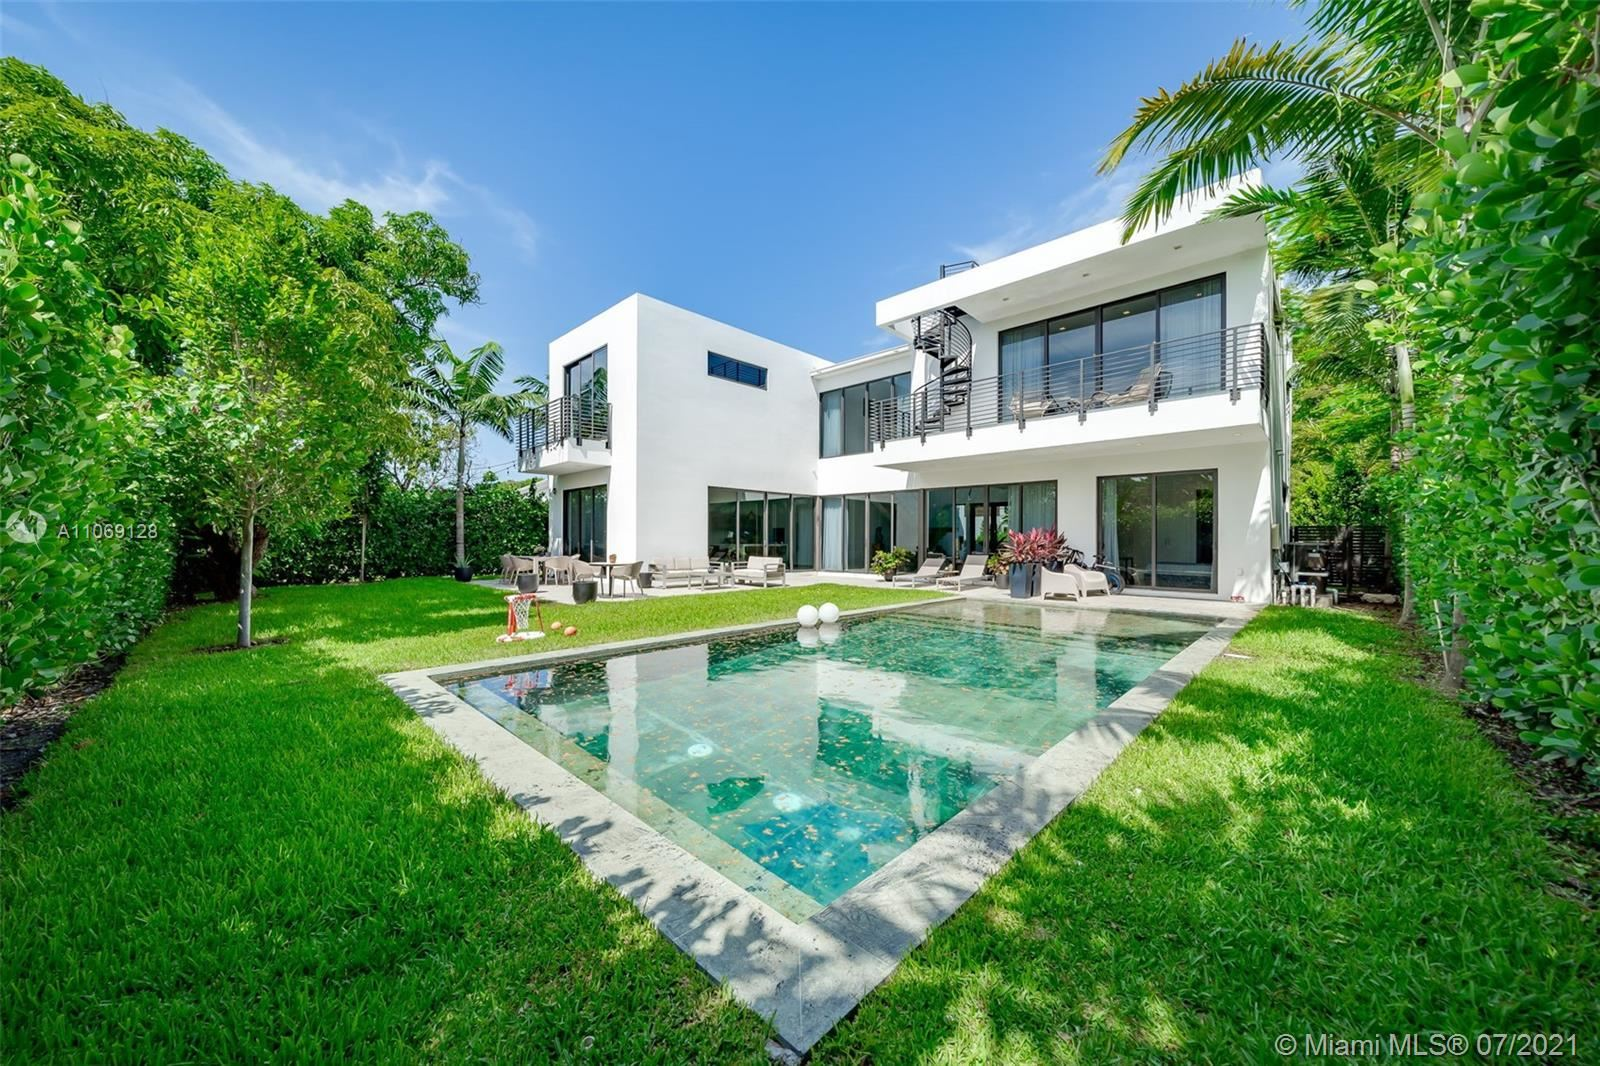 Photo of 4494 Adams Ave, Miami Beach, FL 33140 (MLS # A11069128)